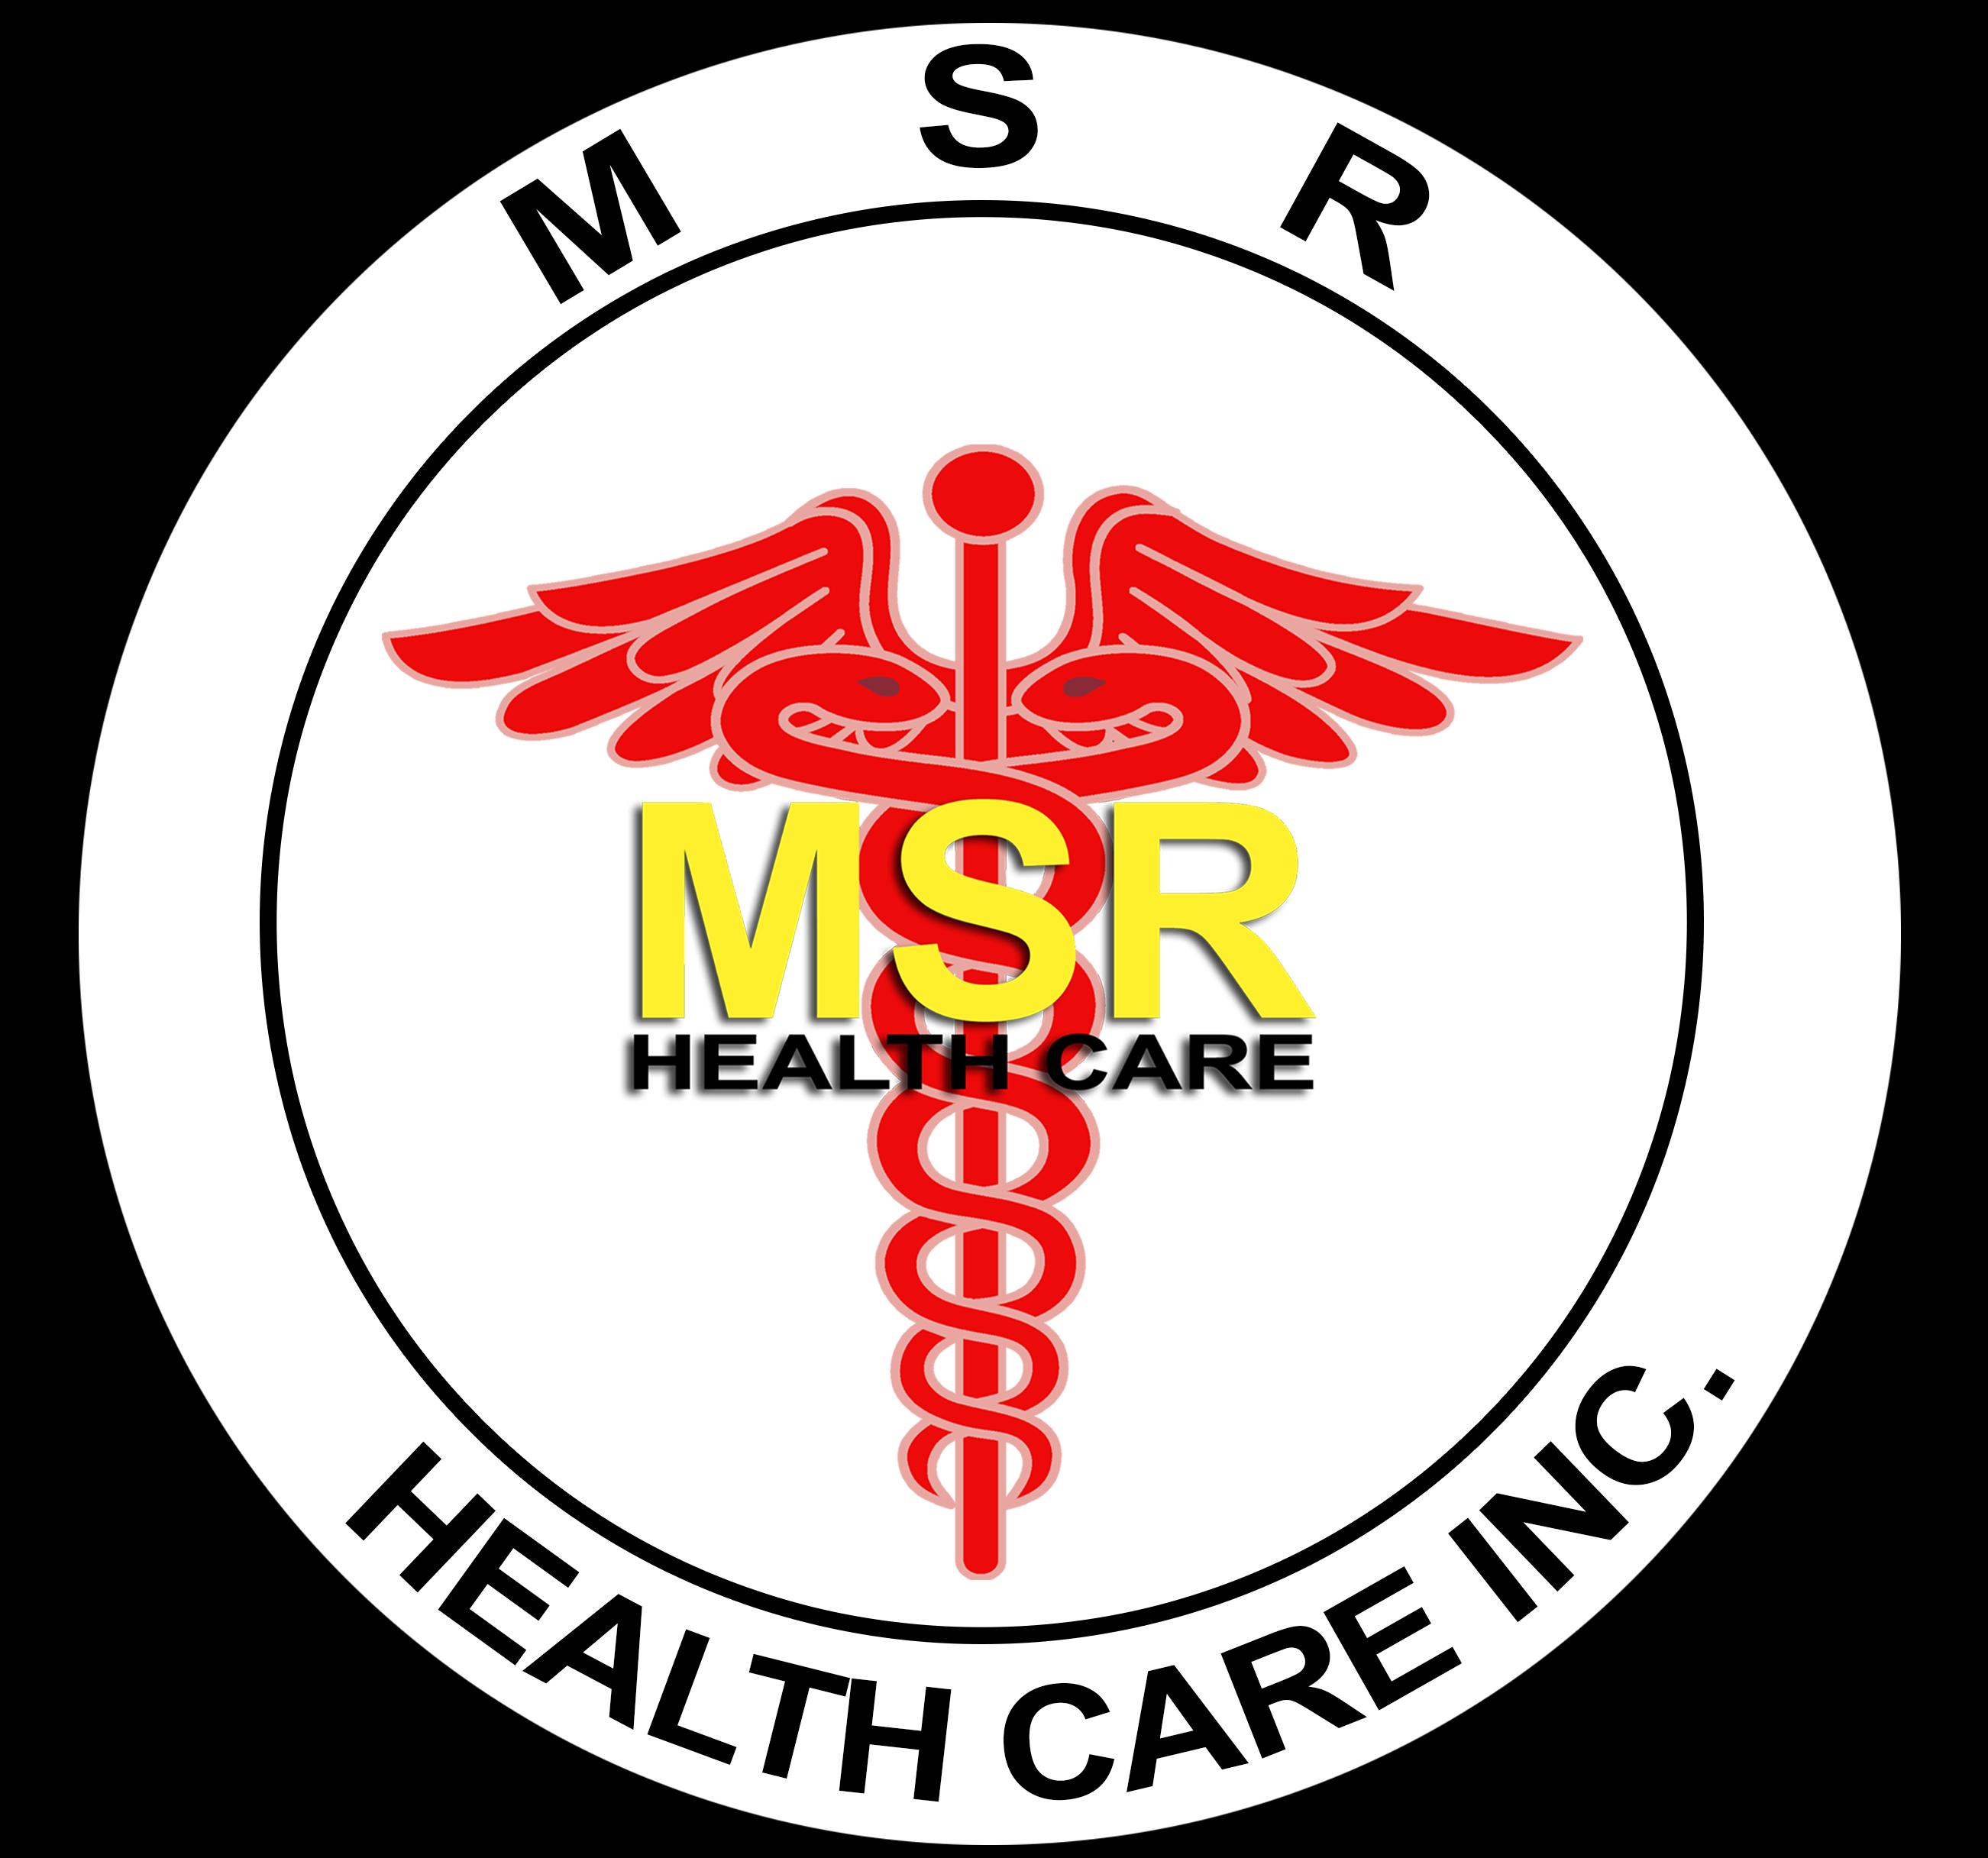 MSR HEALTH CARE